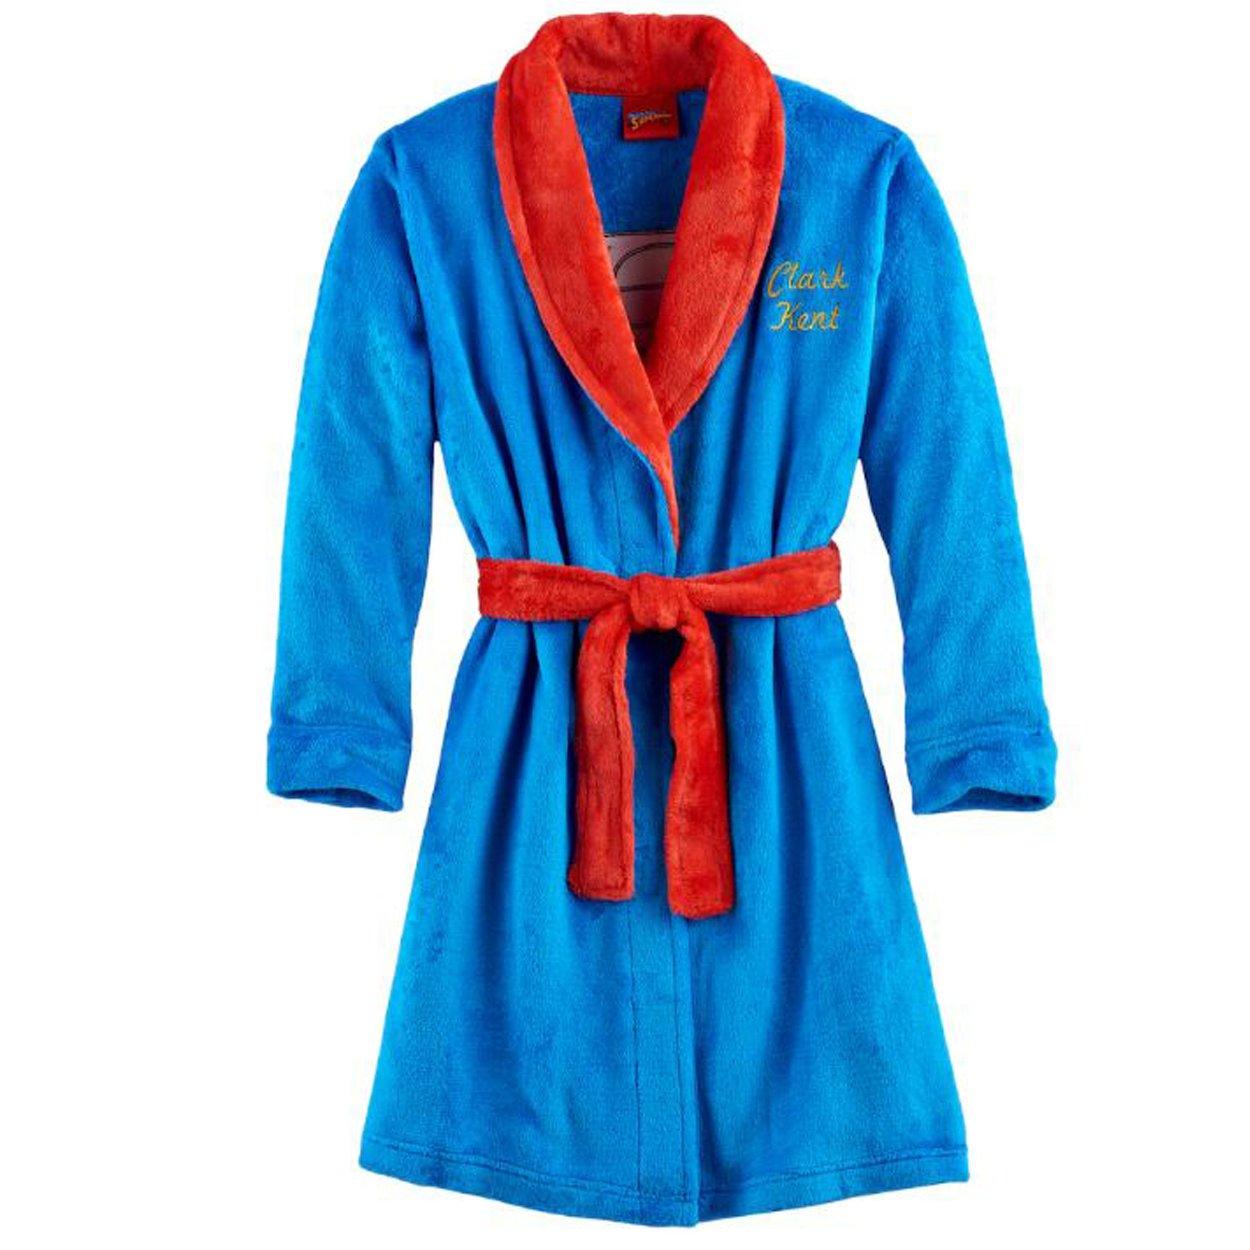 Superman Boys Fleece Bathrobe Robe (Toddler/Little Kid/Big Kid) manufacturer